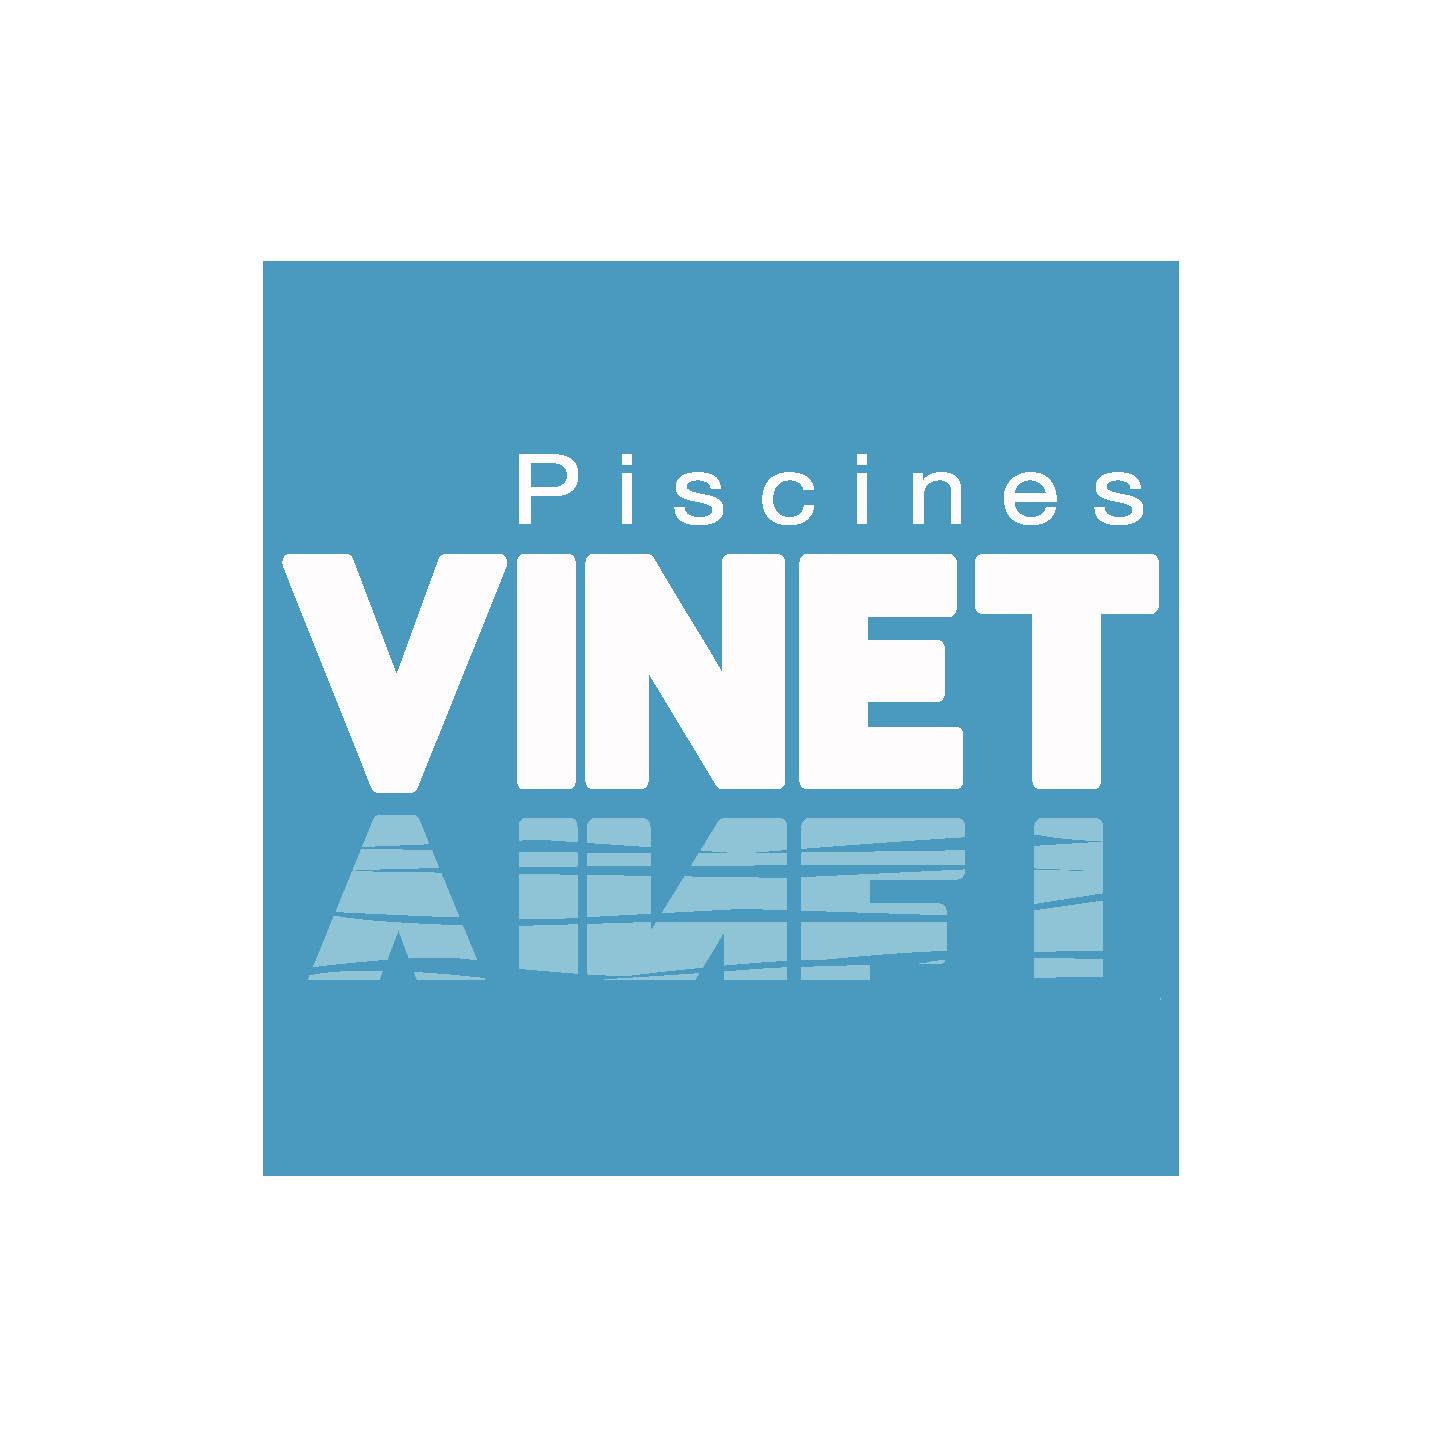 Piscines Vinet pour Piscine Vinet